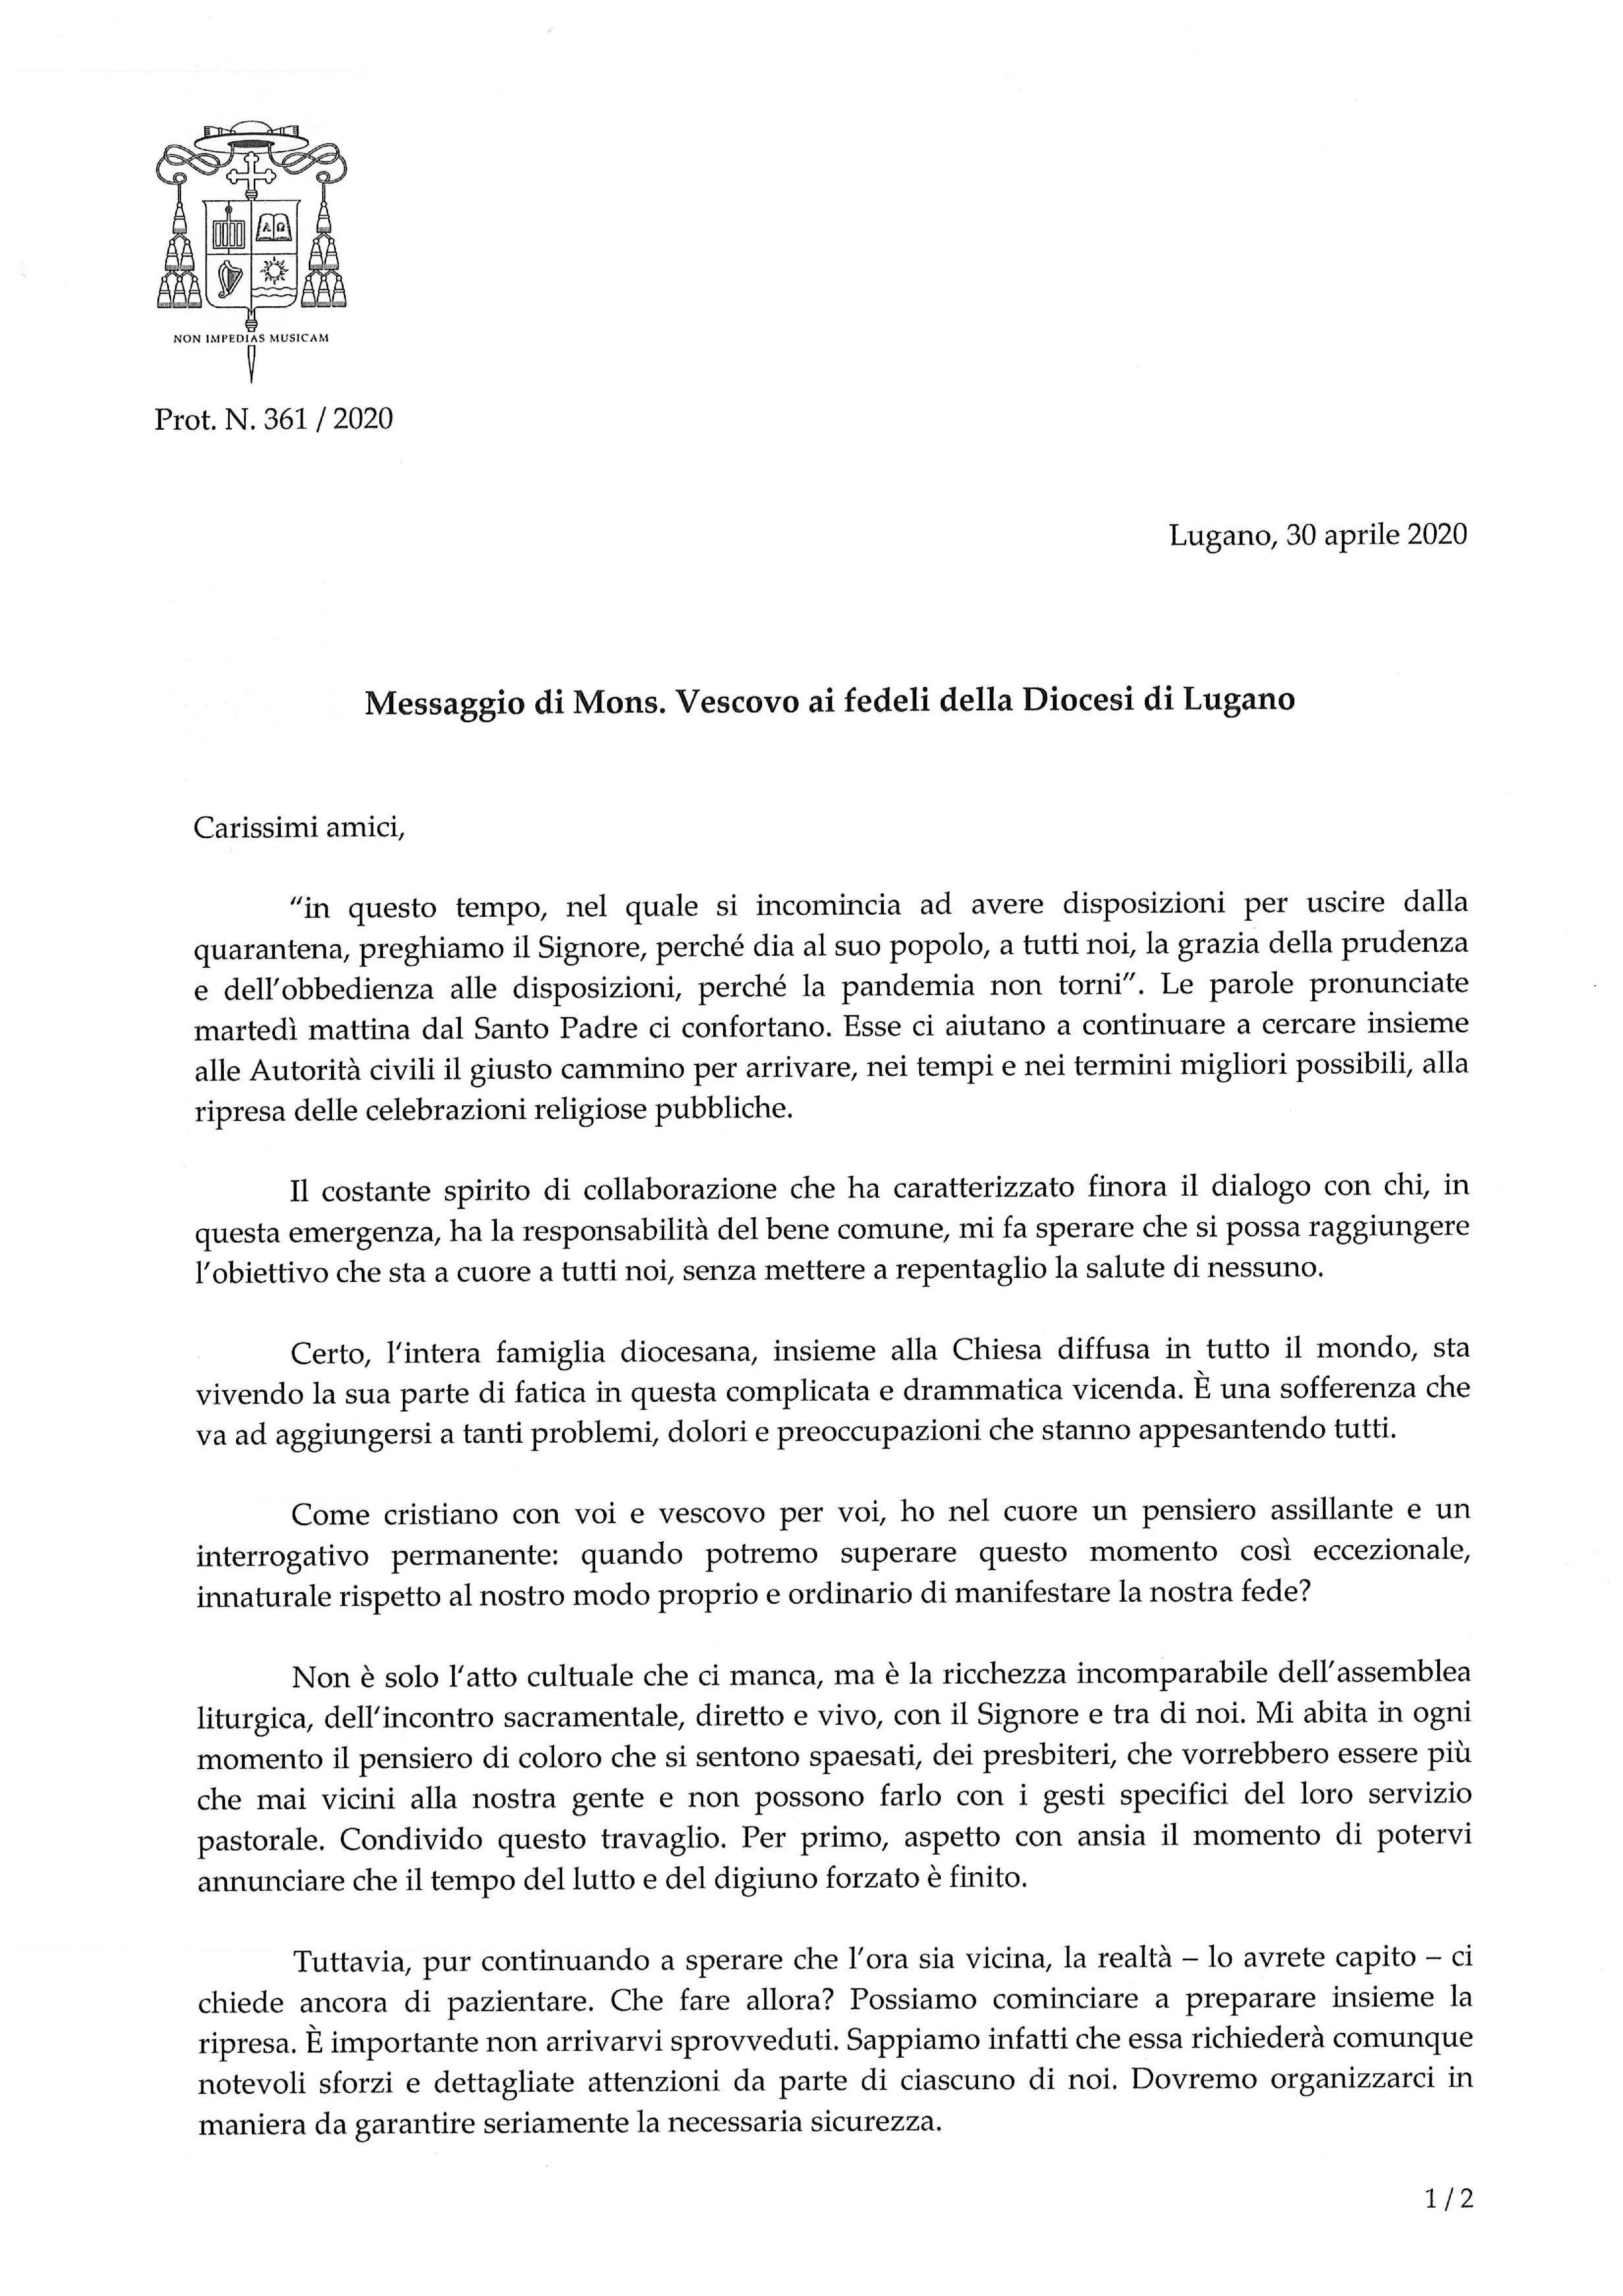 361_Diocesi_Cvid-19_messaggio_200430-001